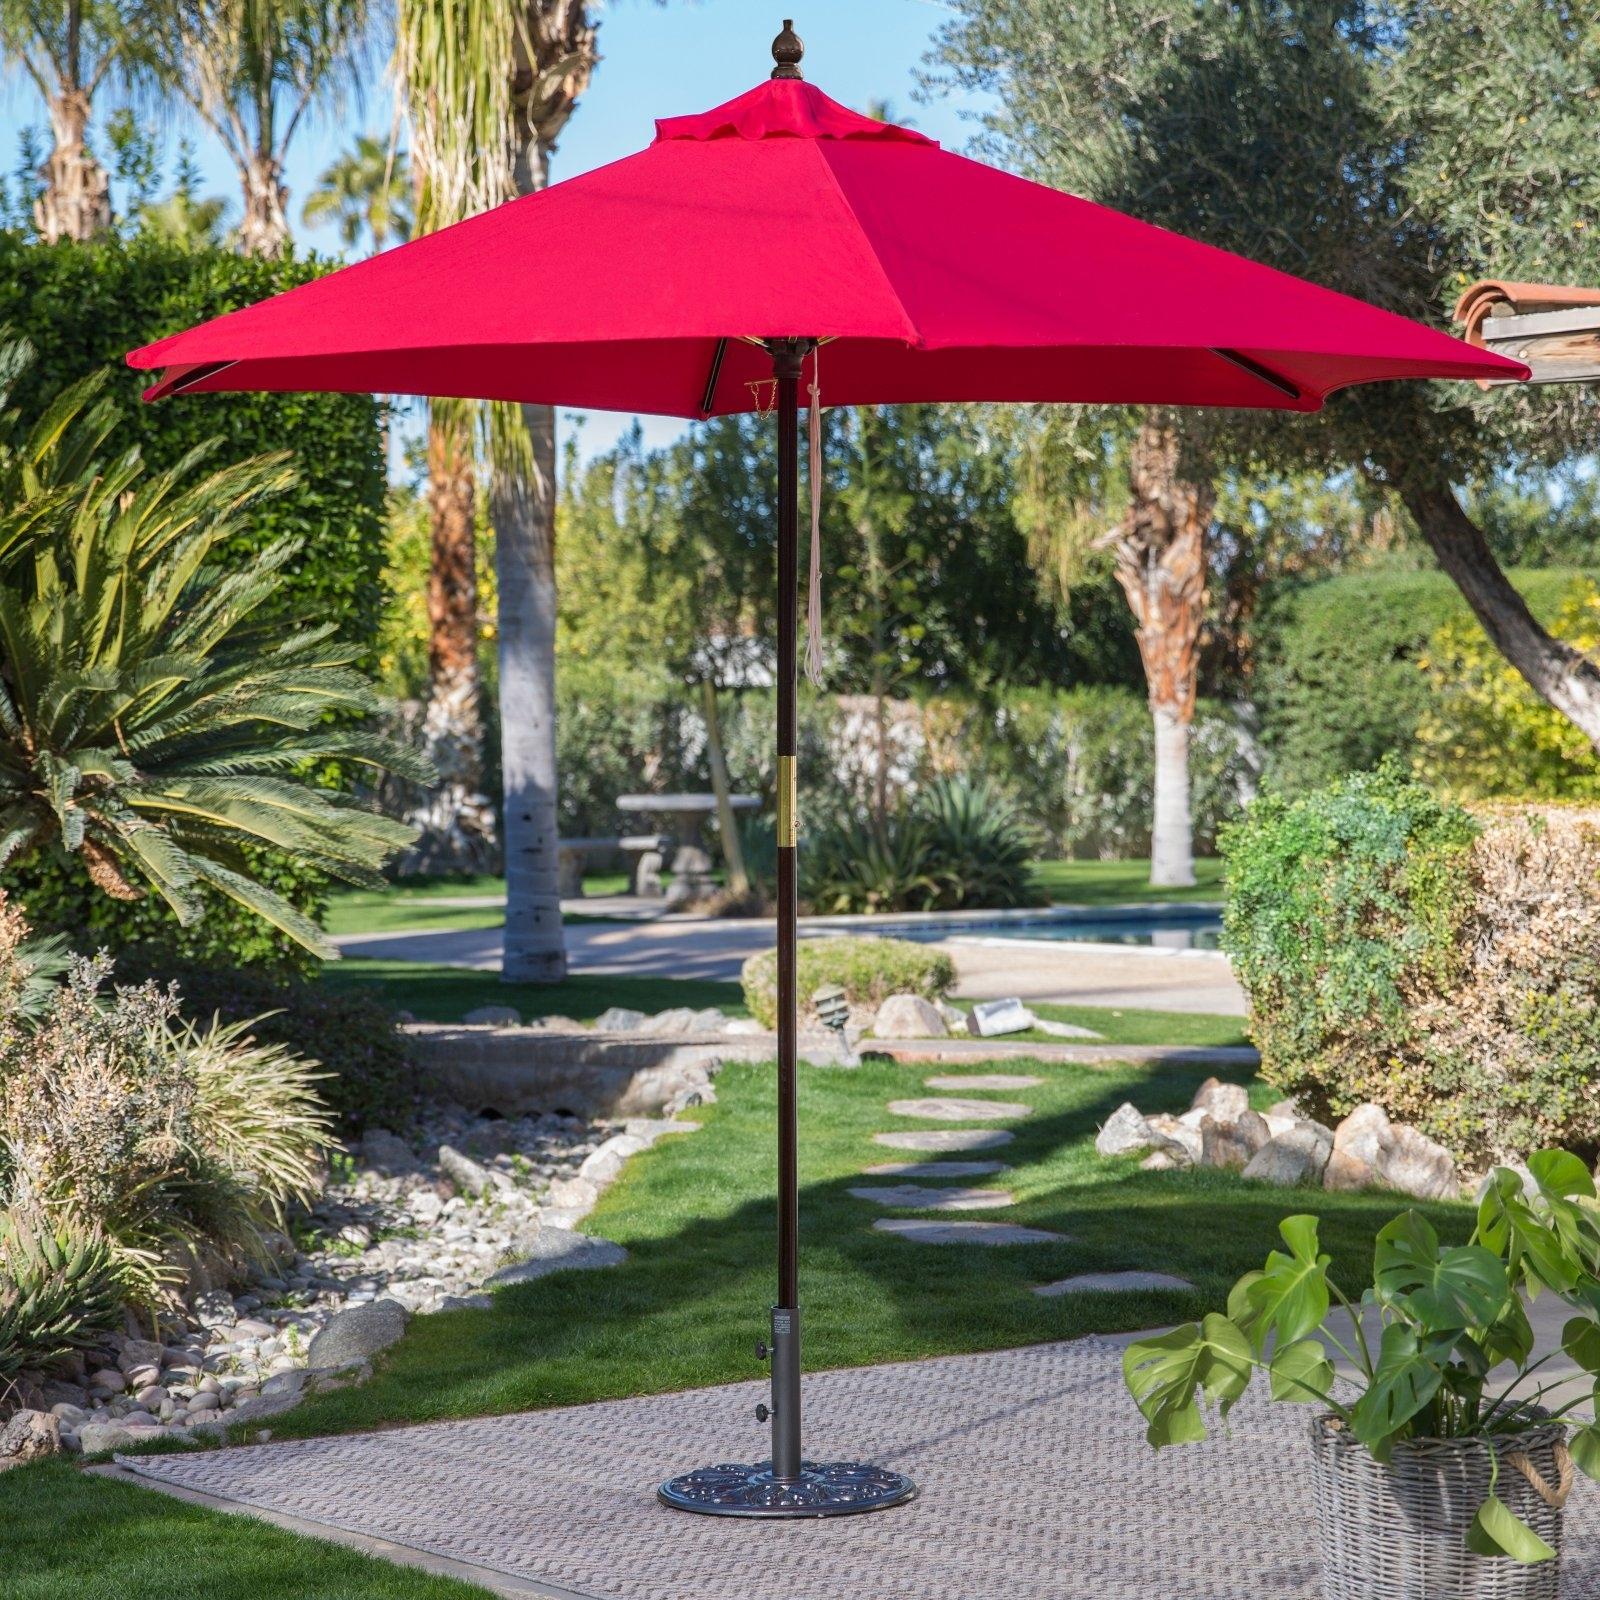 Favorite Commercial Patio Umbrellas Sunbrella Pertaining To Belham Living 7.5 Ft Sunbrella Commercial Grade Aluminum Wind (Gallery 3 of 20)